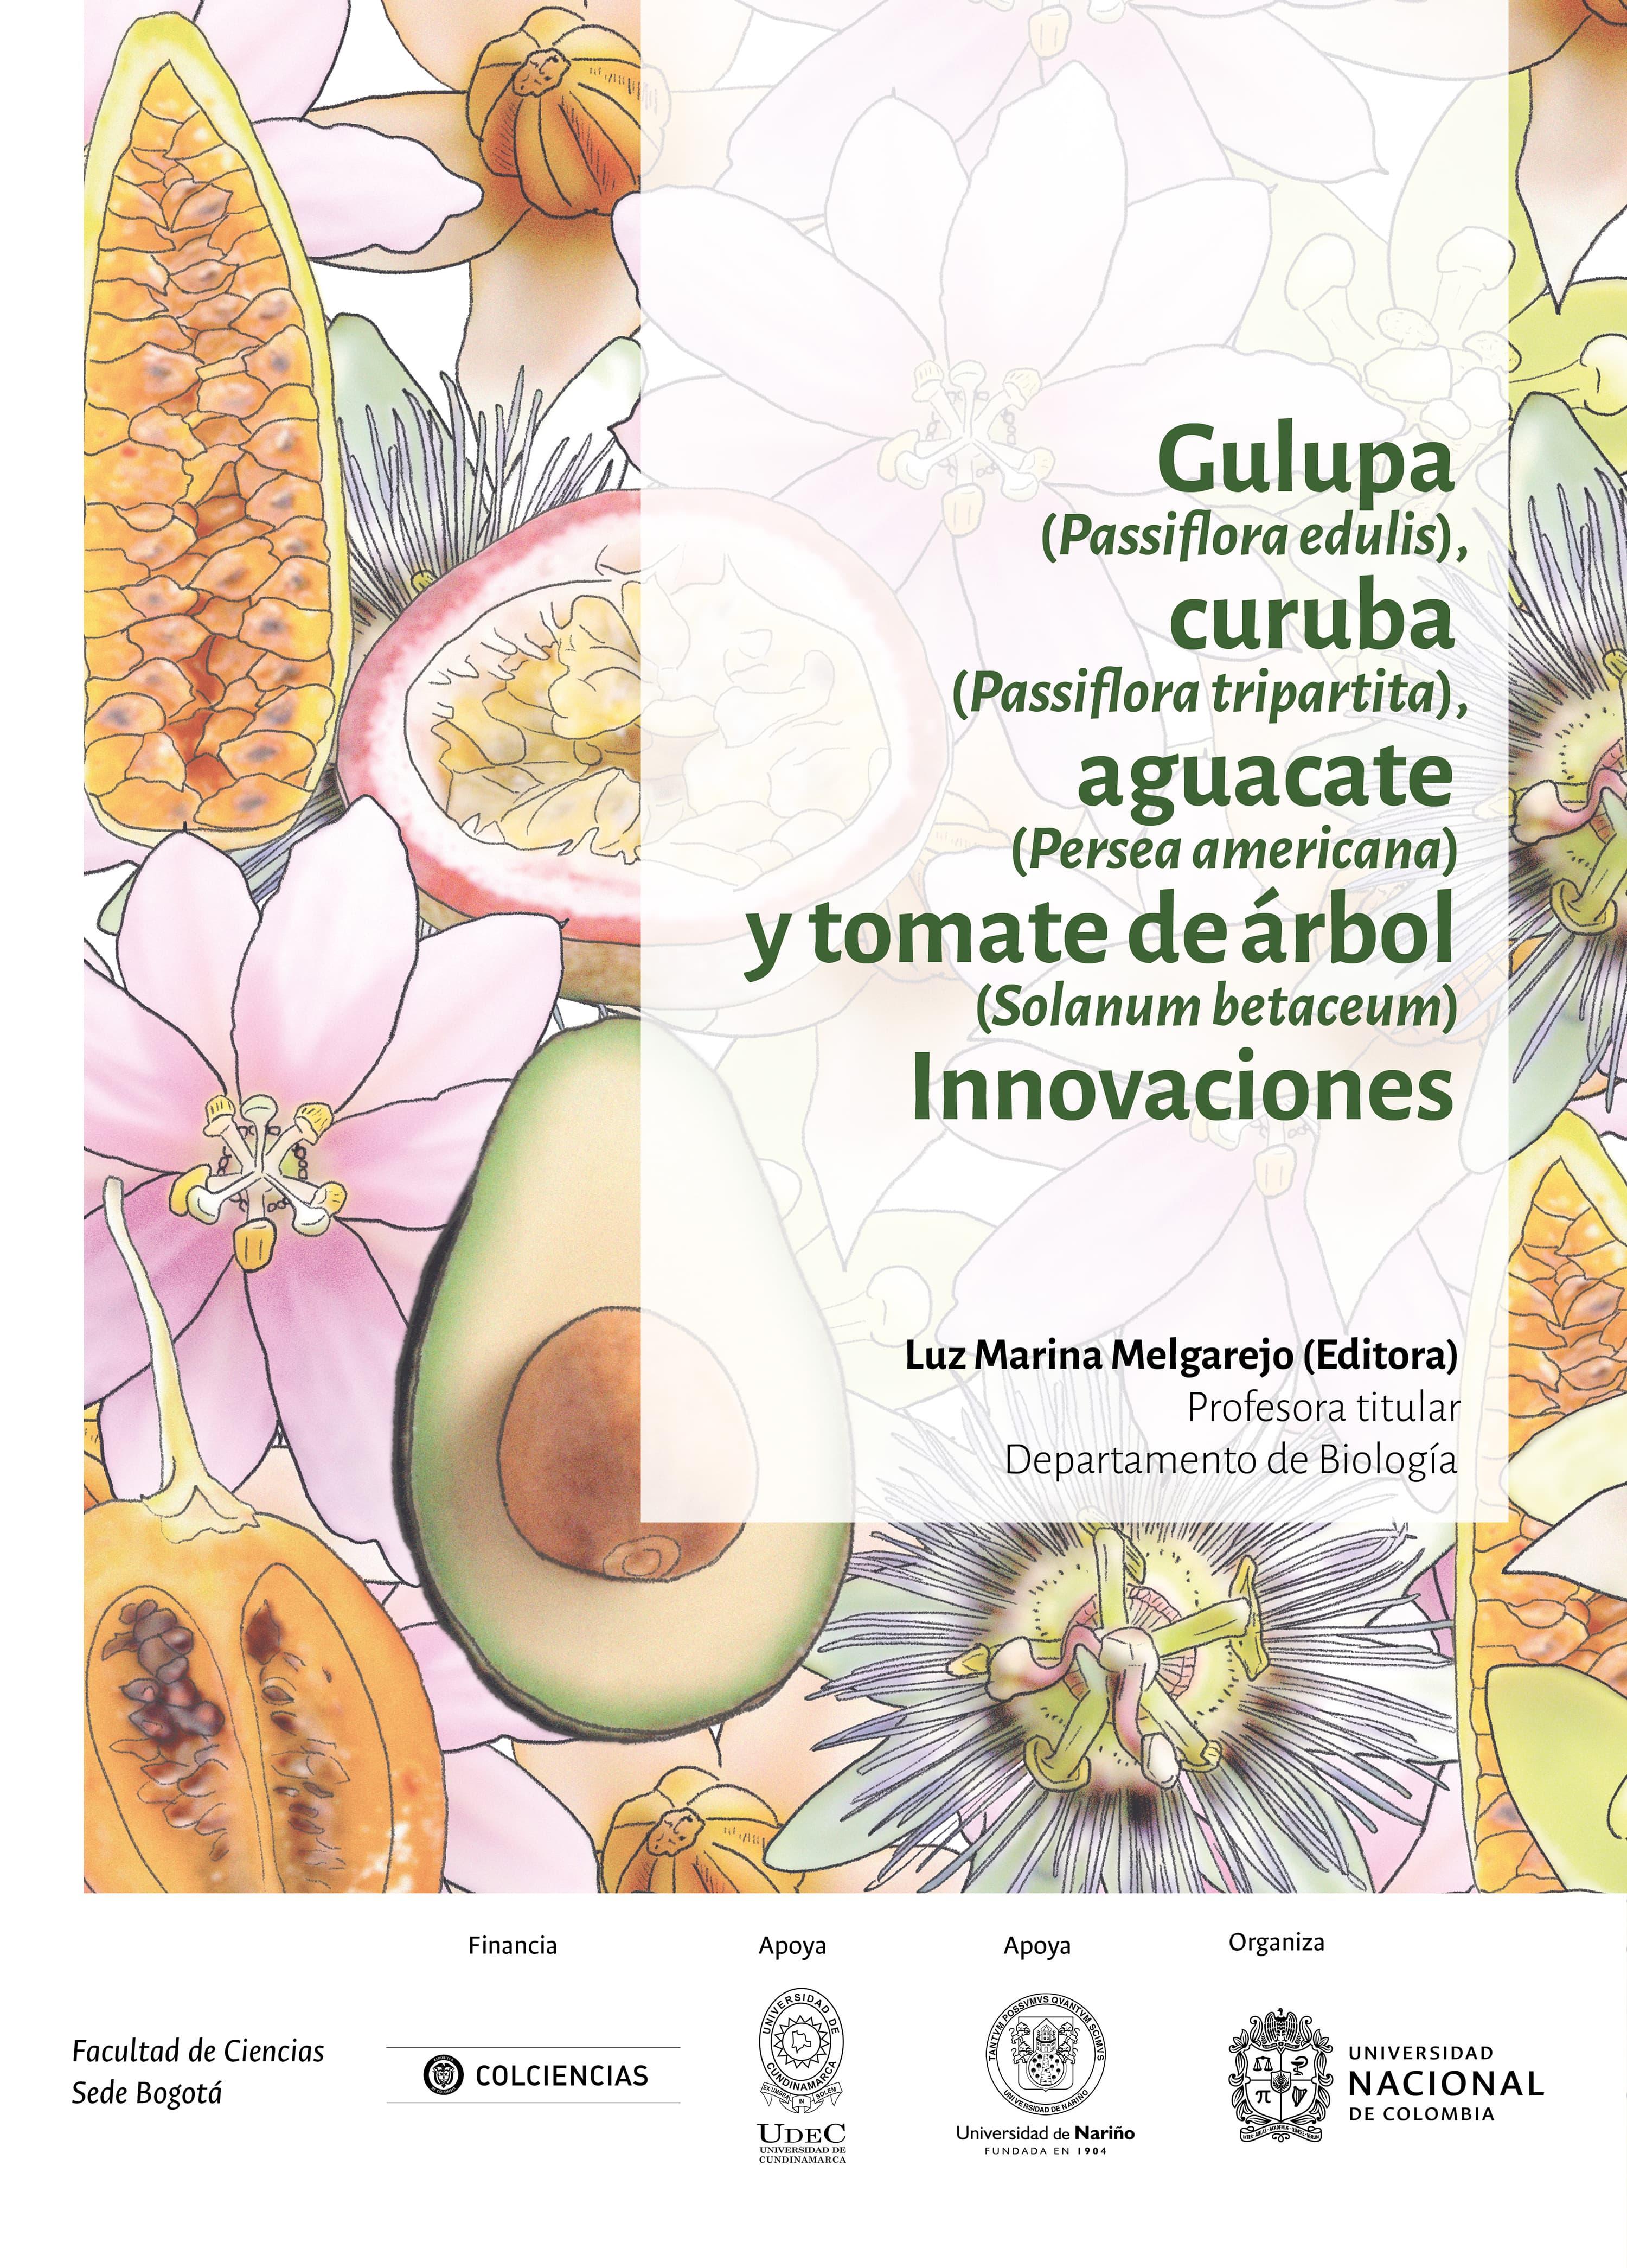 Gulupa (Passiflora edulis), curuba (Passiflora tripartita), aguacate (Persea americana) y tomate de árbol (Solanum betaceum) Innovaciones